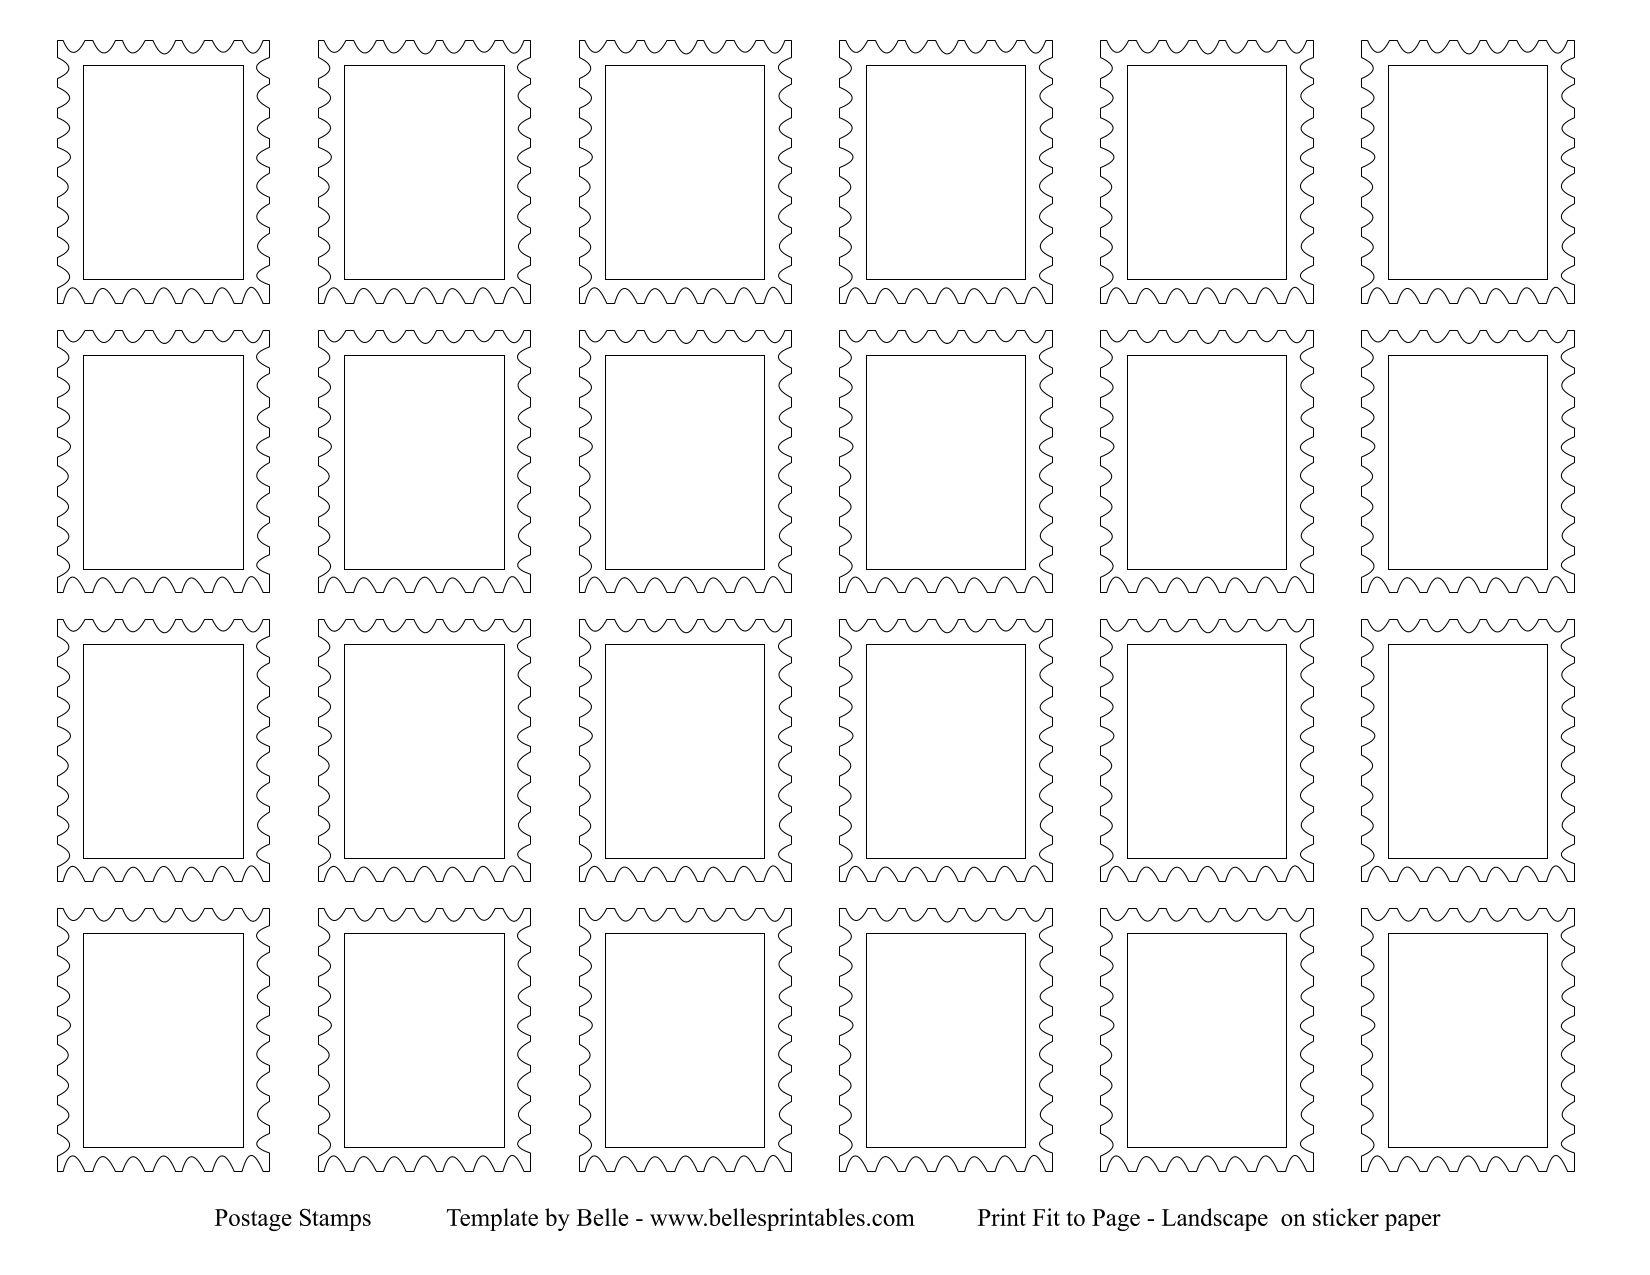 Printable Postage Stamps Patterns